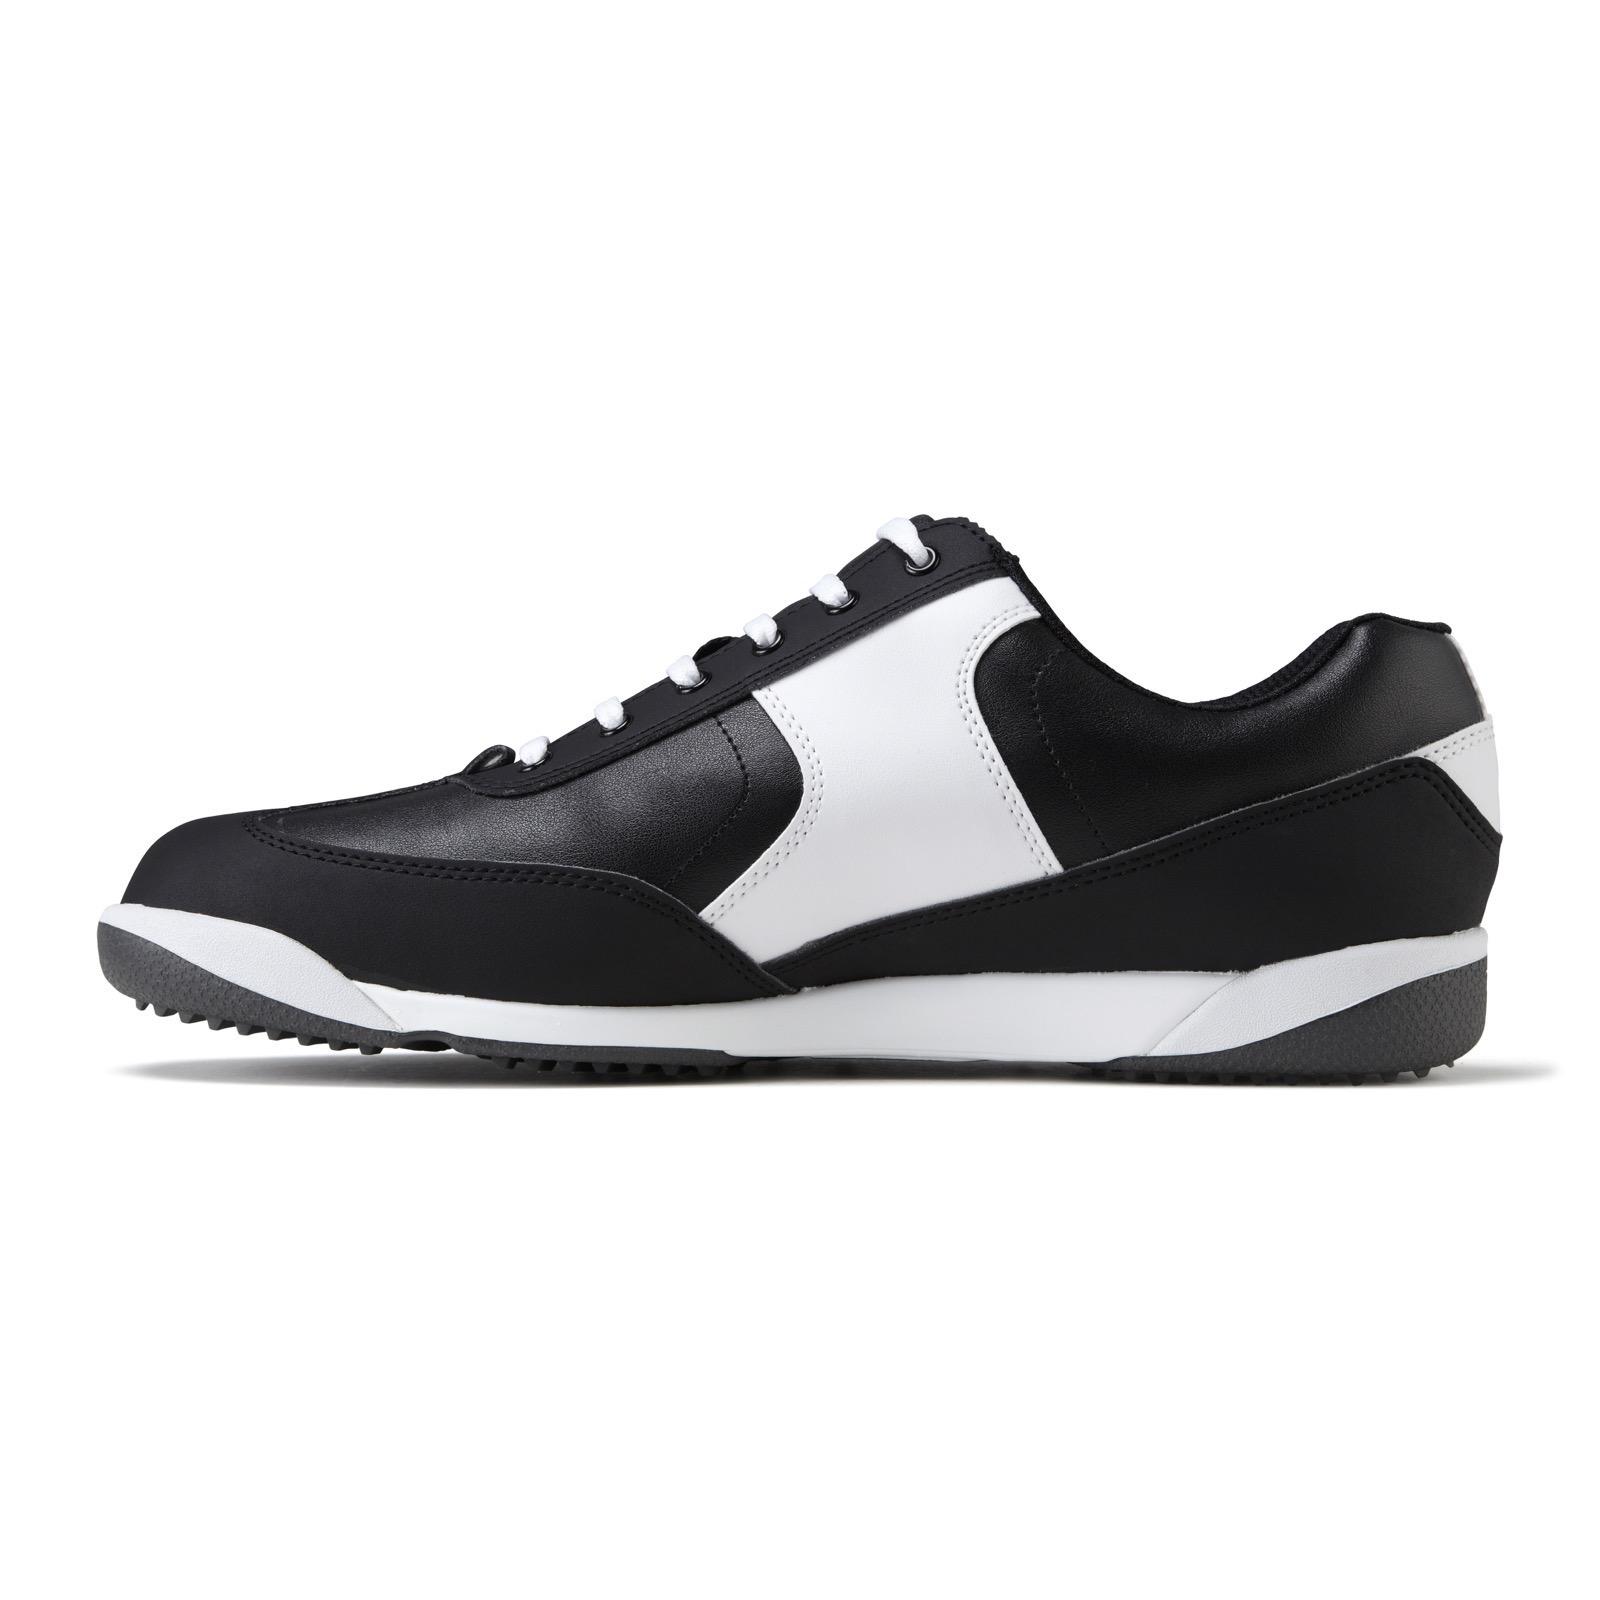 footjoy awd xl casual golf shoes 57868 black white royal